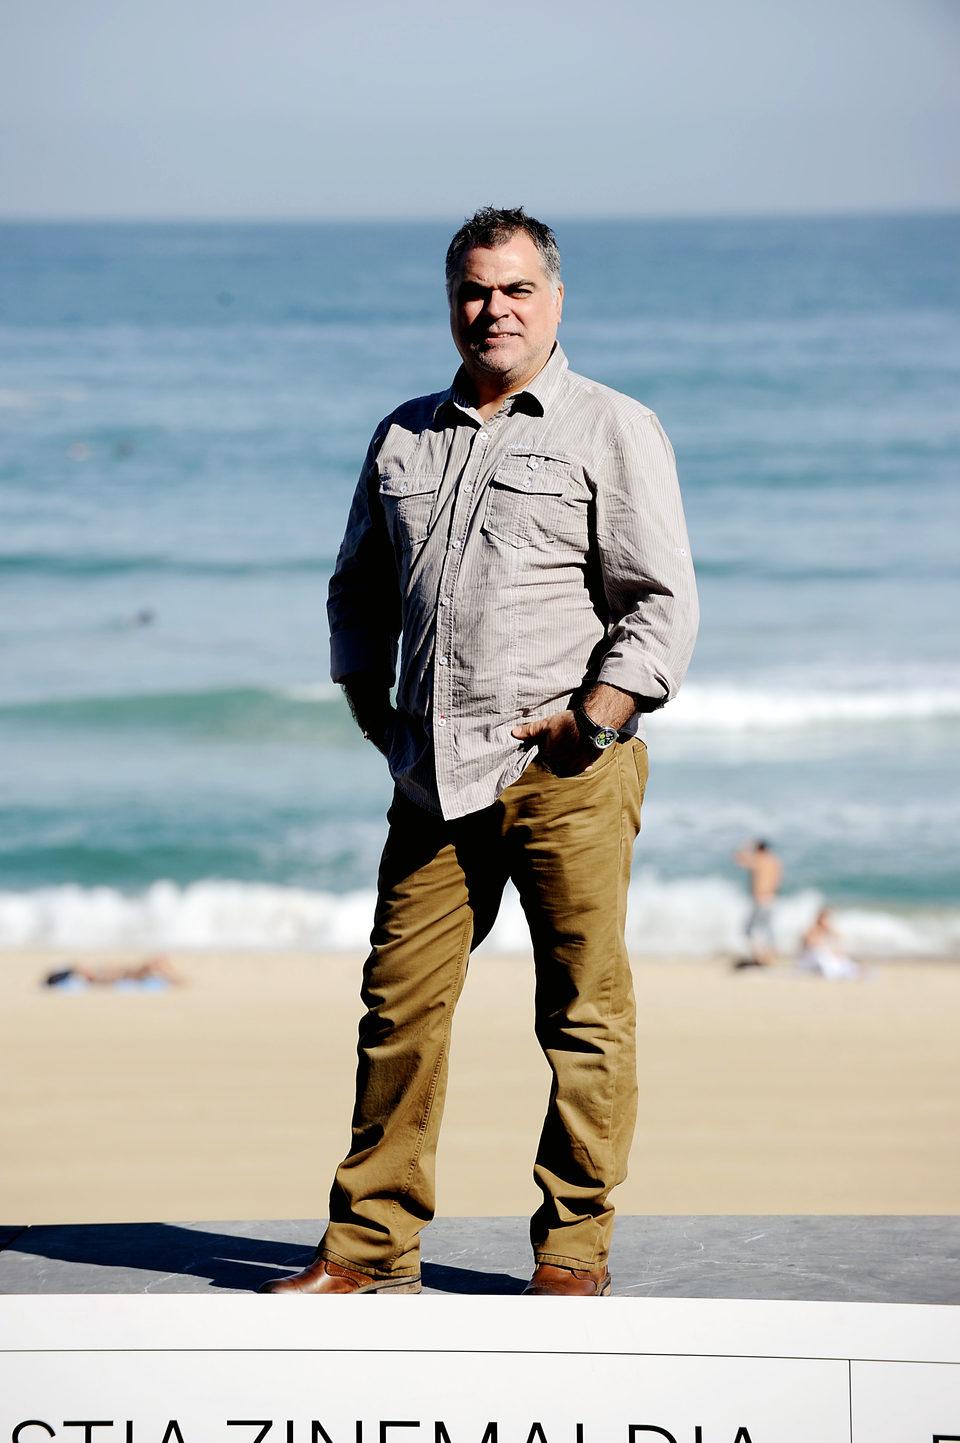 Benito Zambrano posa cerca de la playa en San Sebastián